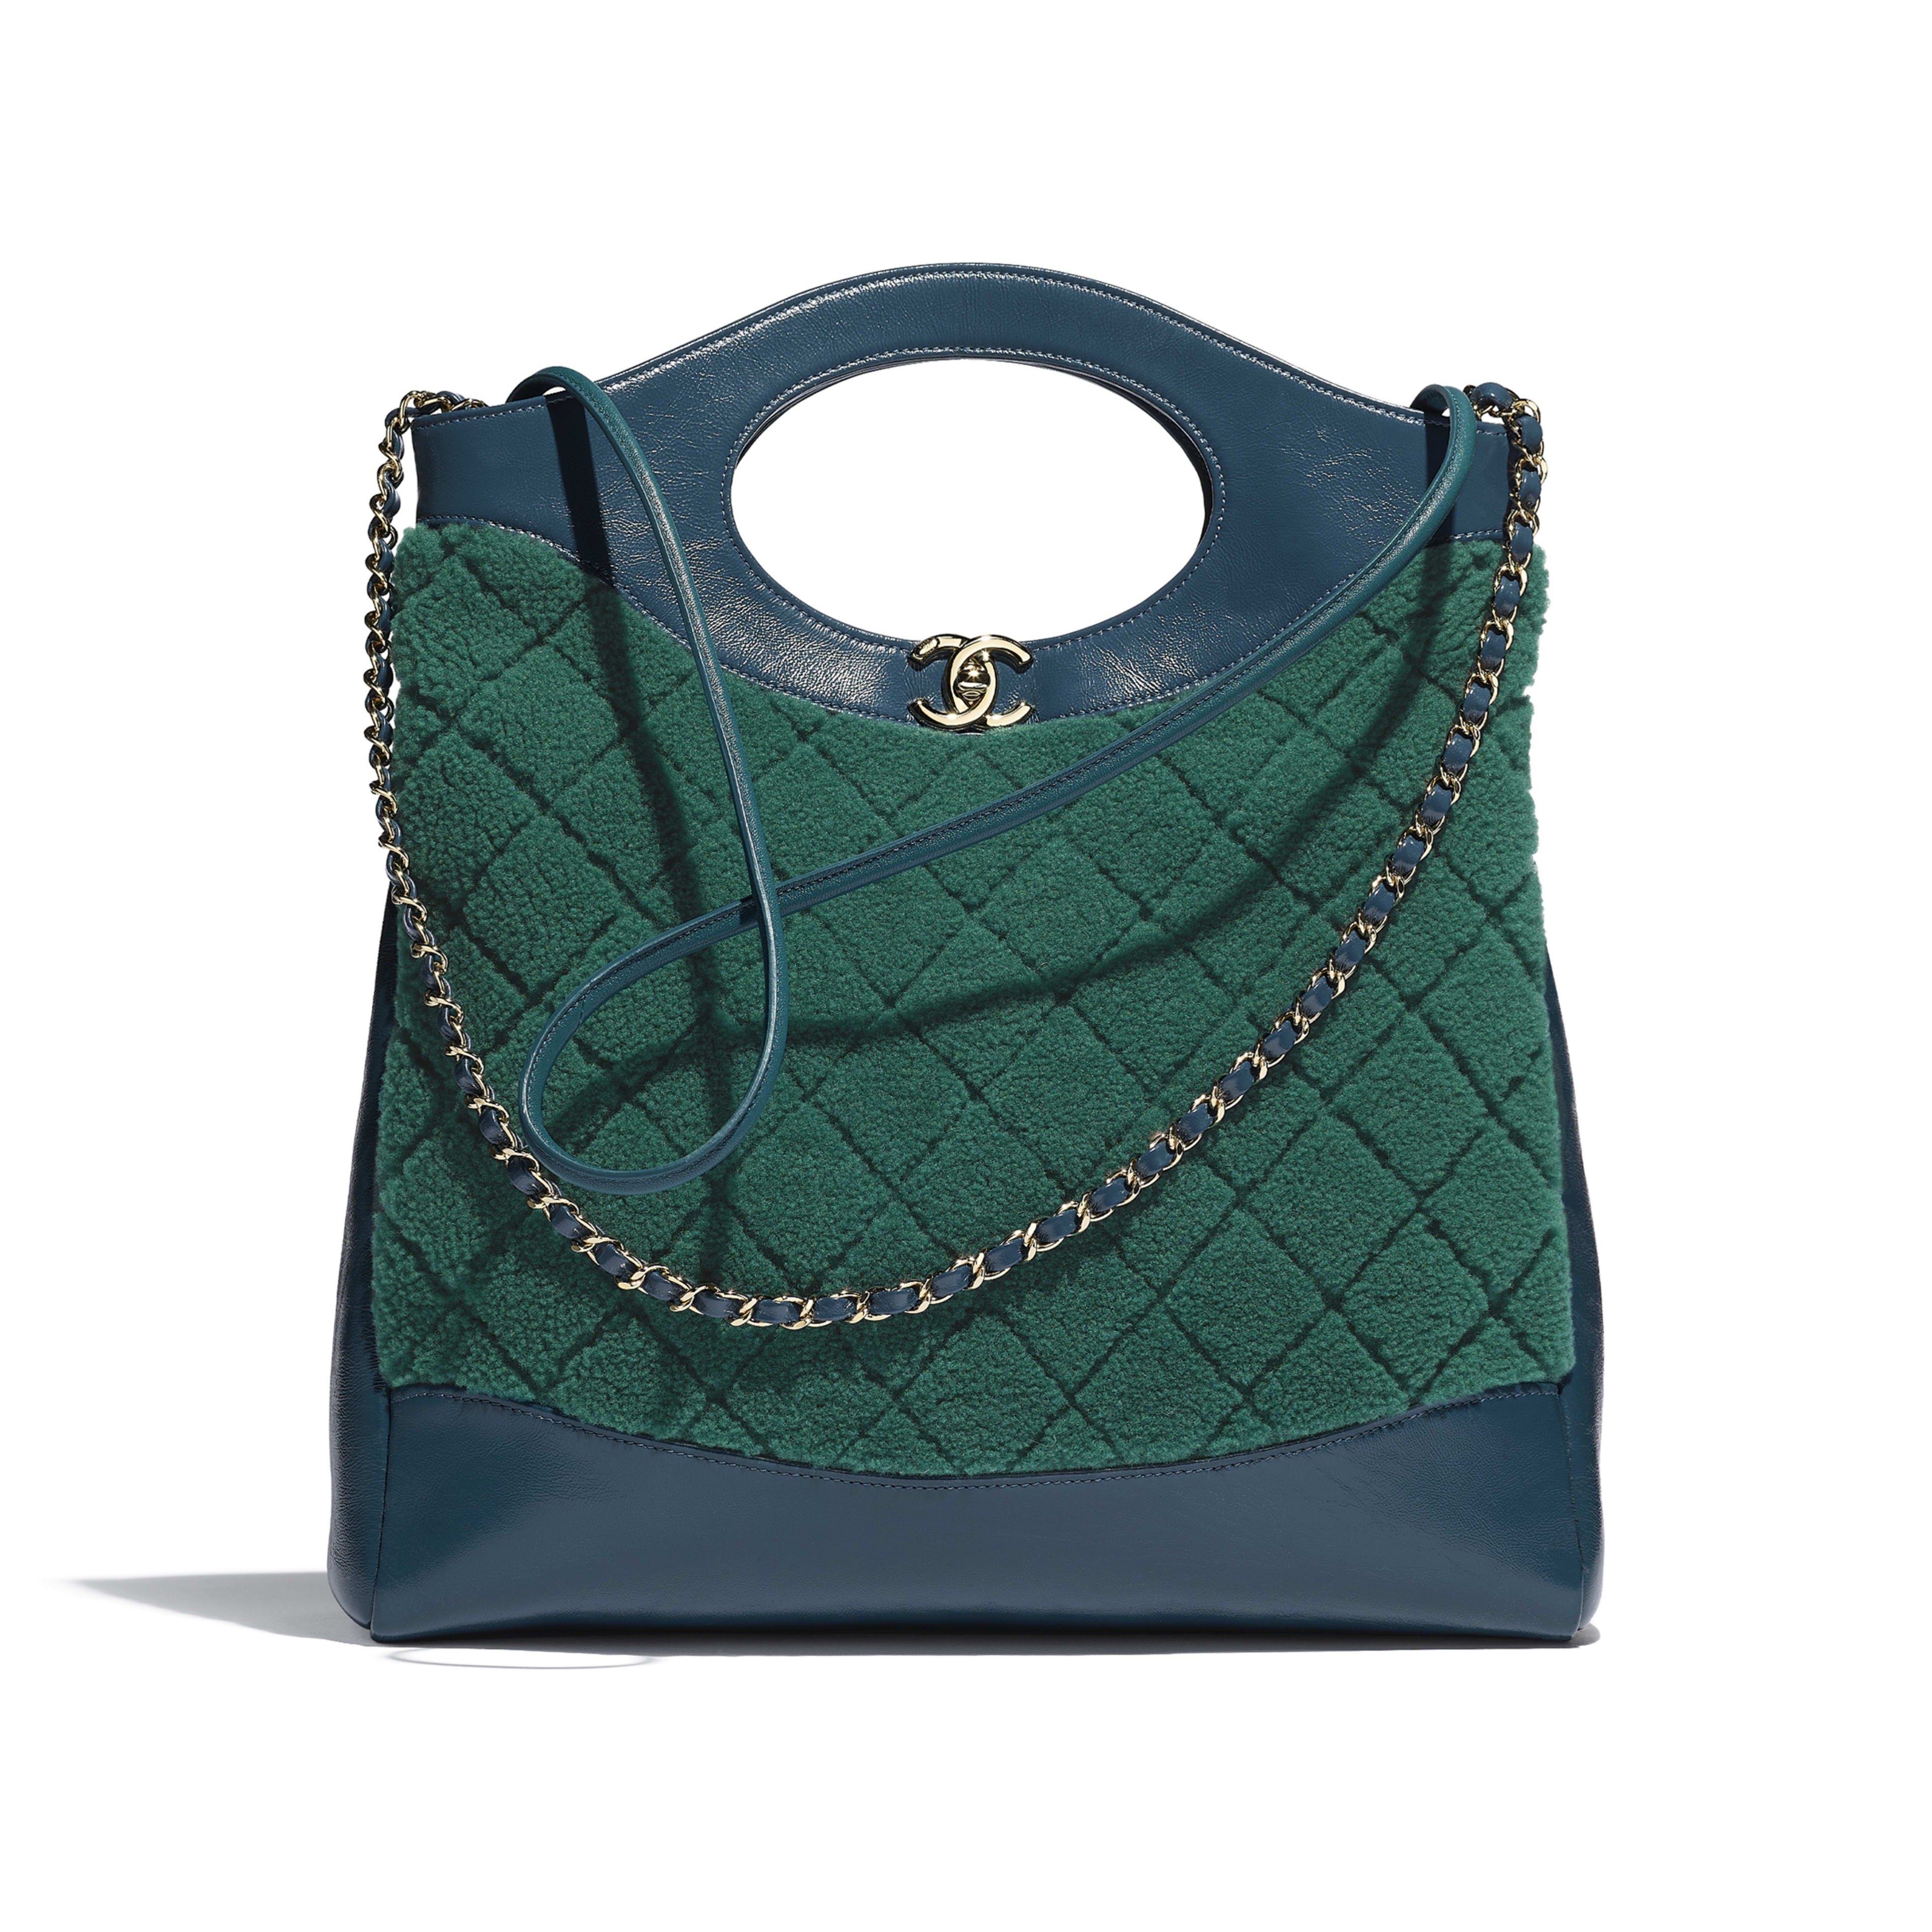 CHANEL 31 Shopping Bag - Green & Blue - Shearling Sheepskin, Calfskin & Gold-Tone Metal - Default view - see full sized version